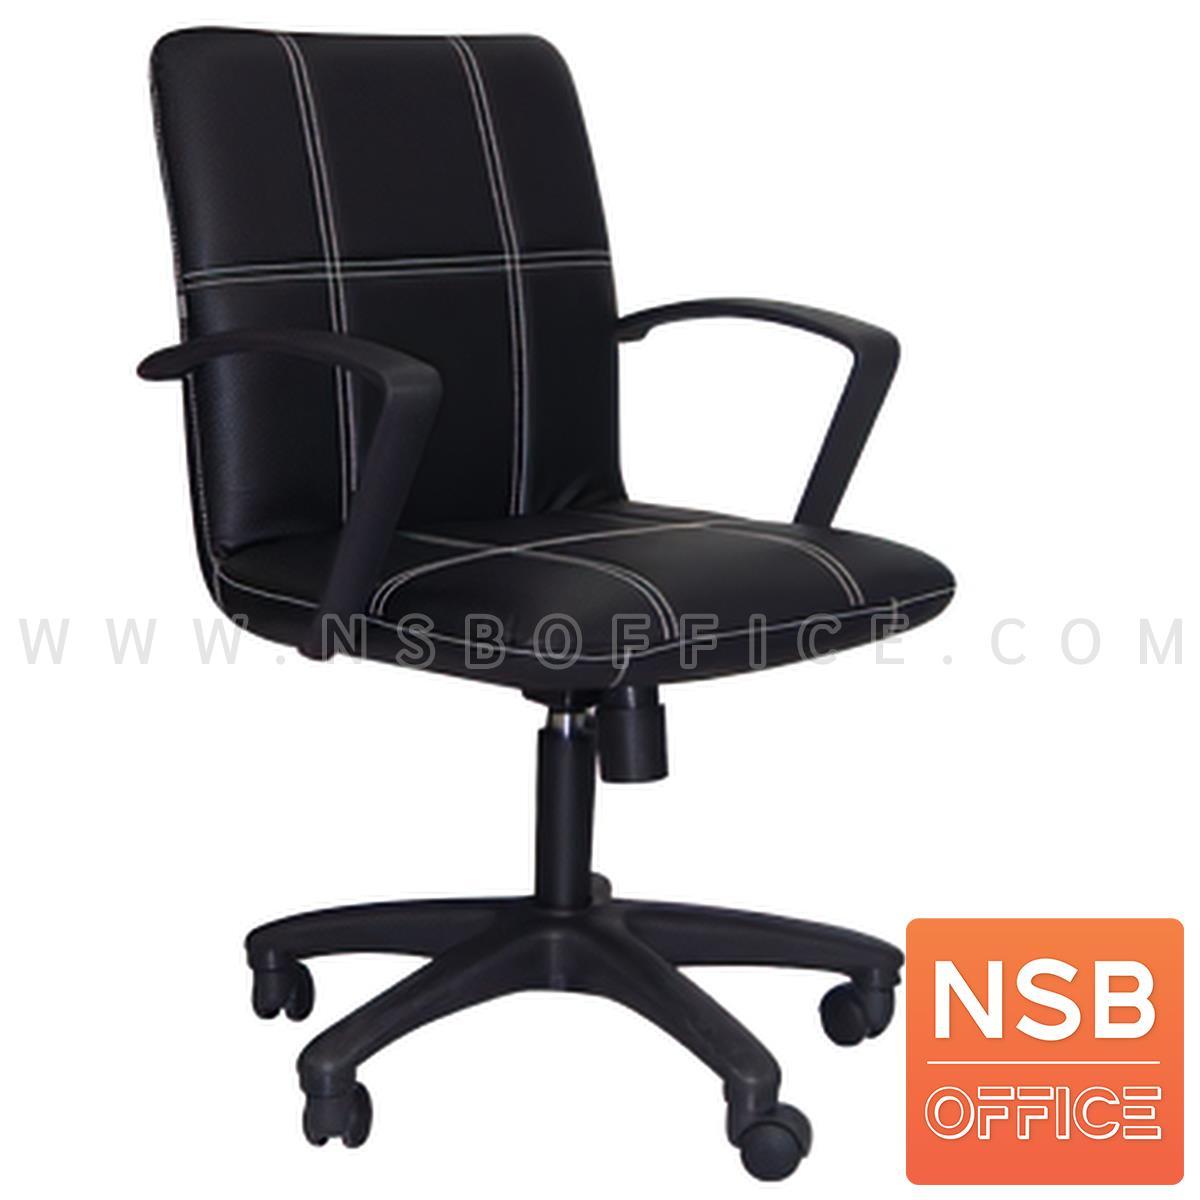 B03A513:เก้าอี้สำนักงาน รุ่น Sugus (ซูกัส)  โช๊คแก๊ส ก้อนโยก ขาพลาสติก